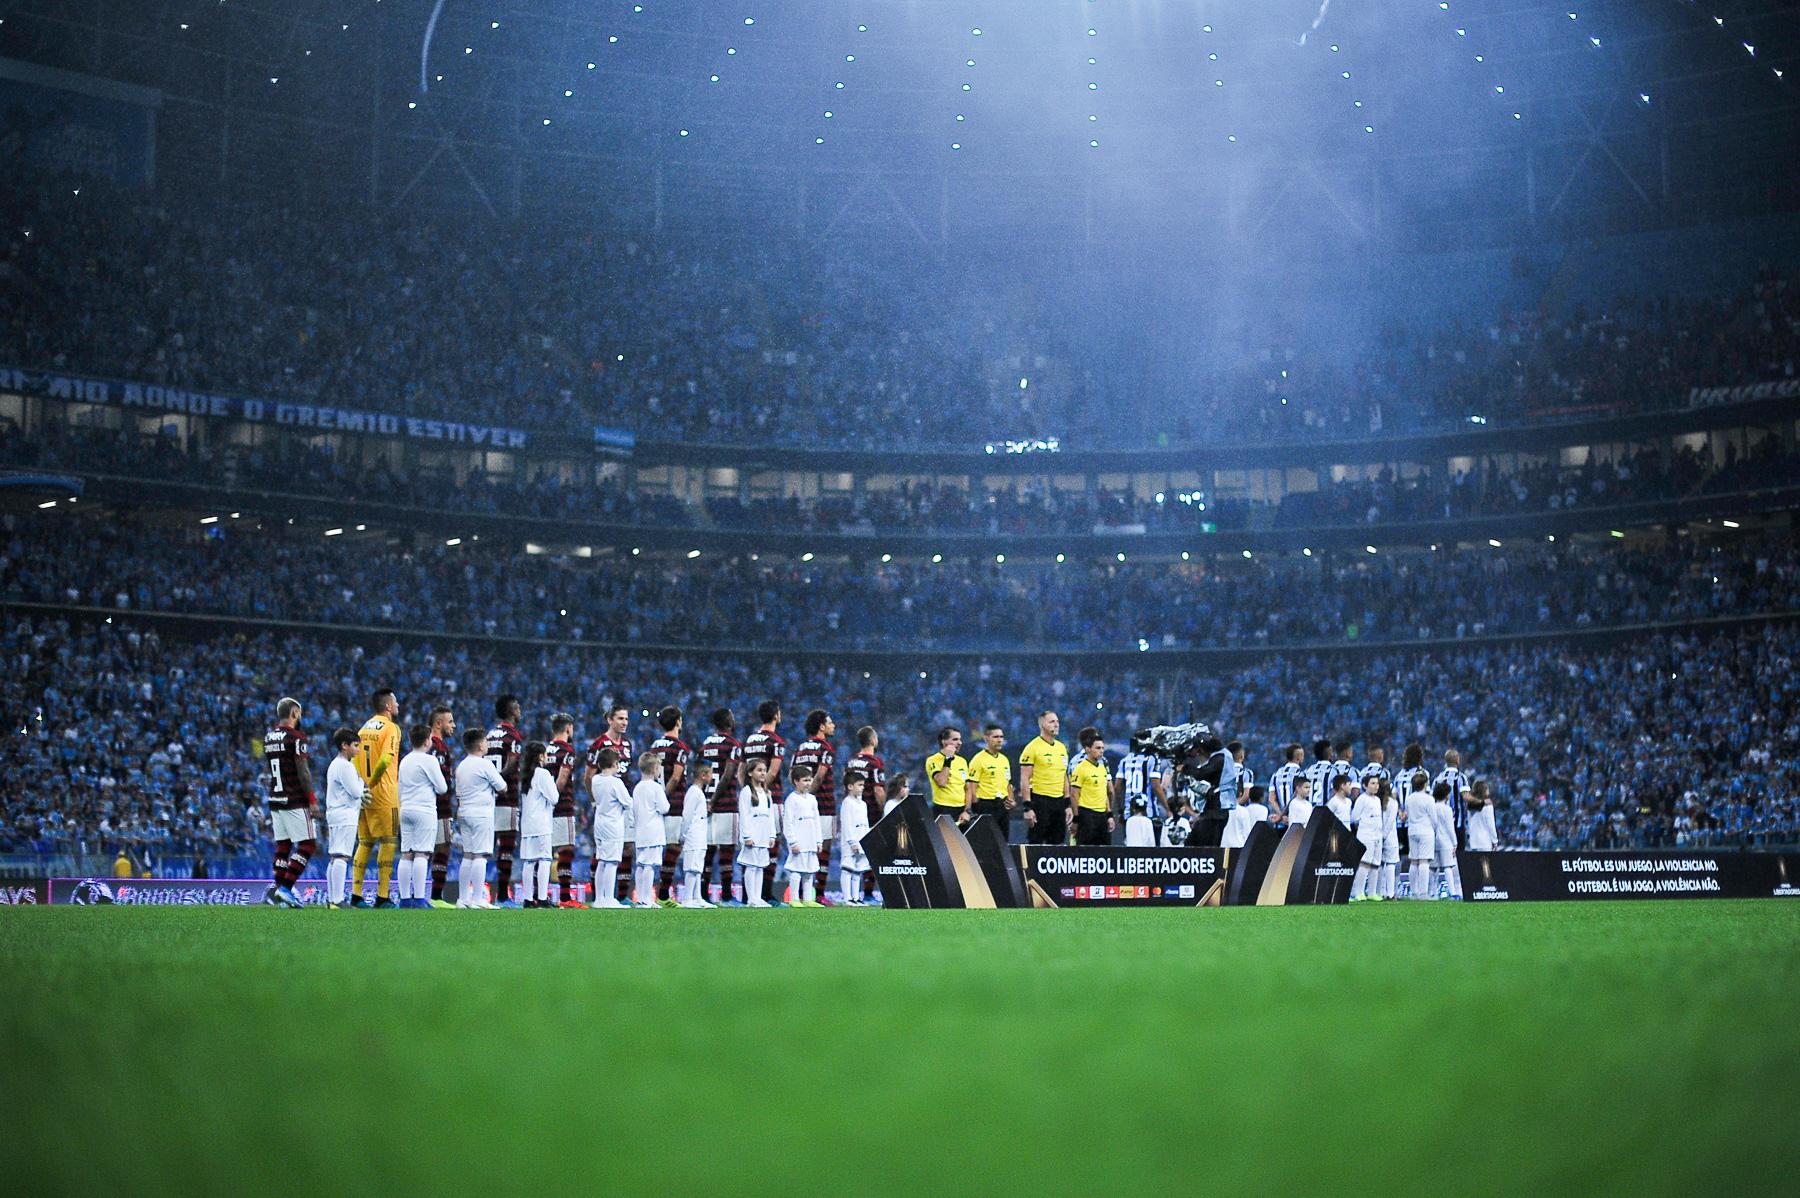 Gremio_X_Flamengo_dudabairros_Eleven_079